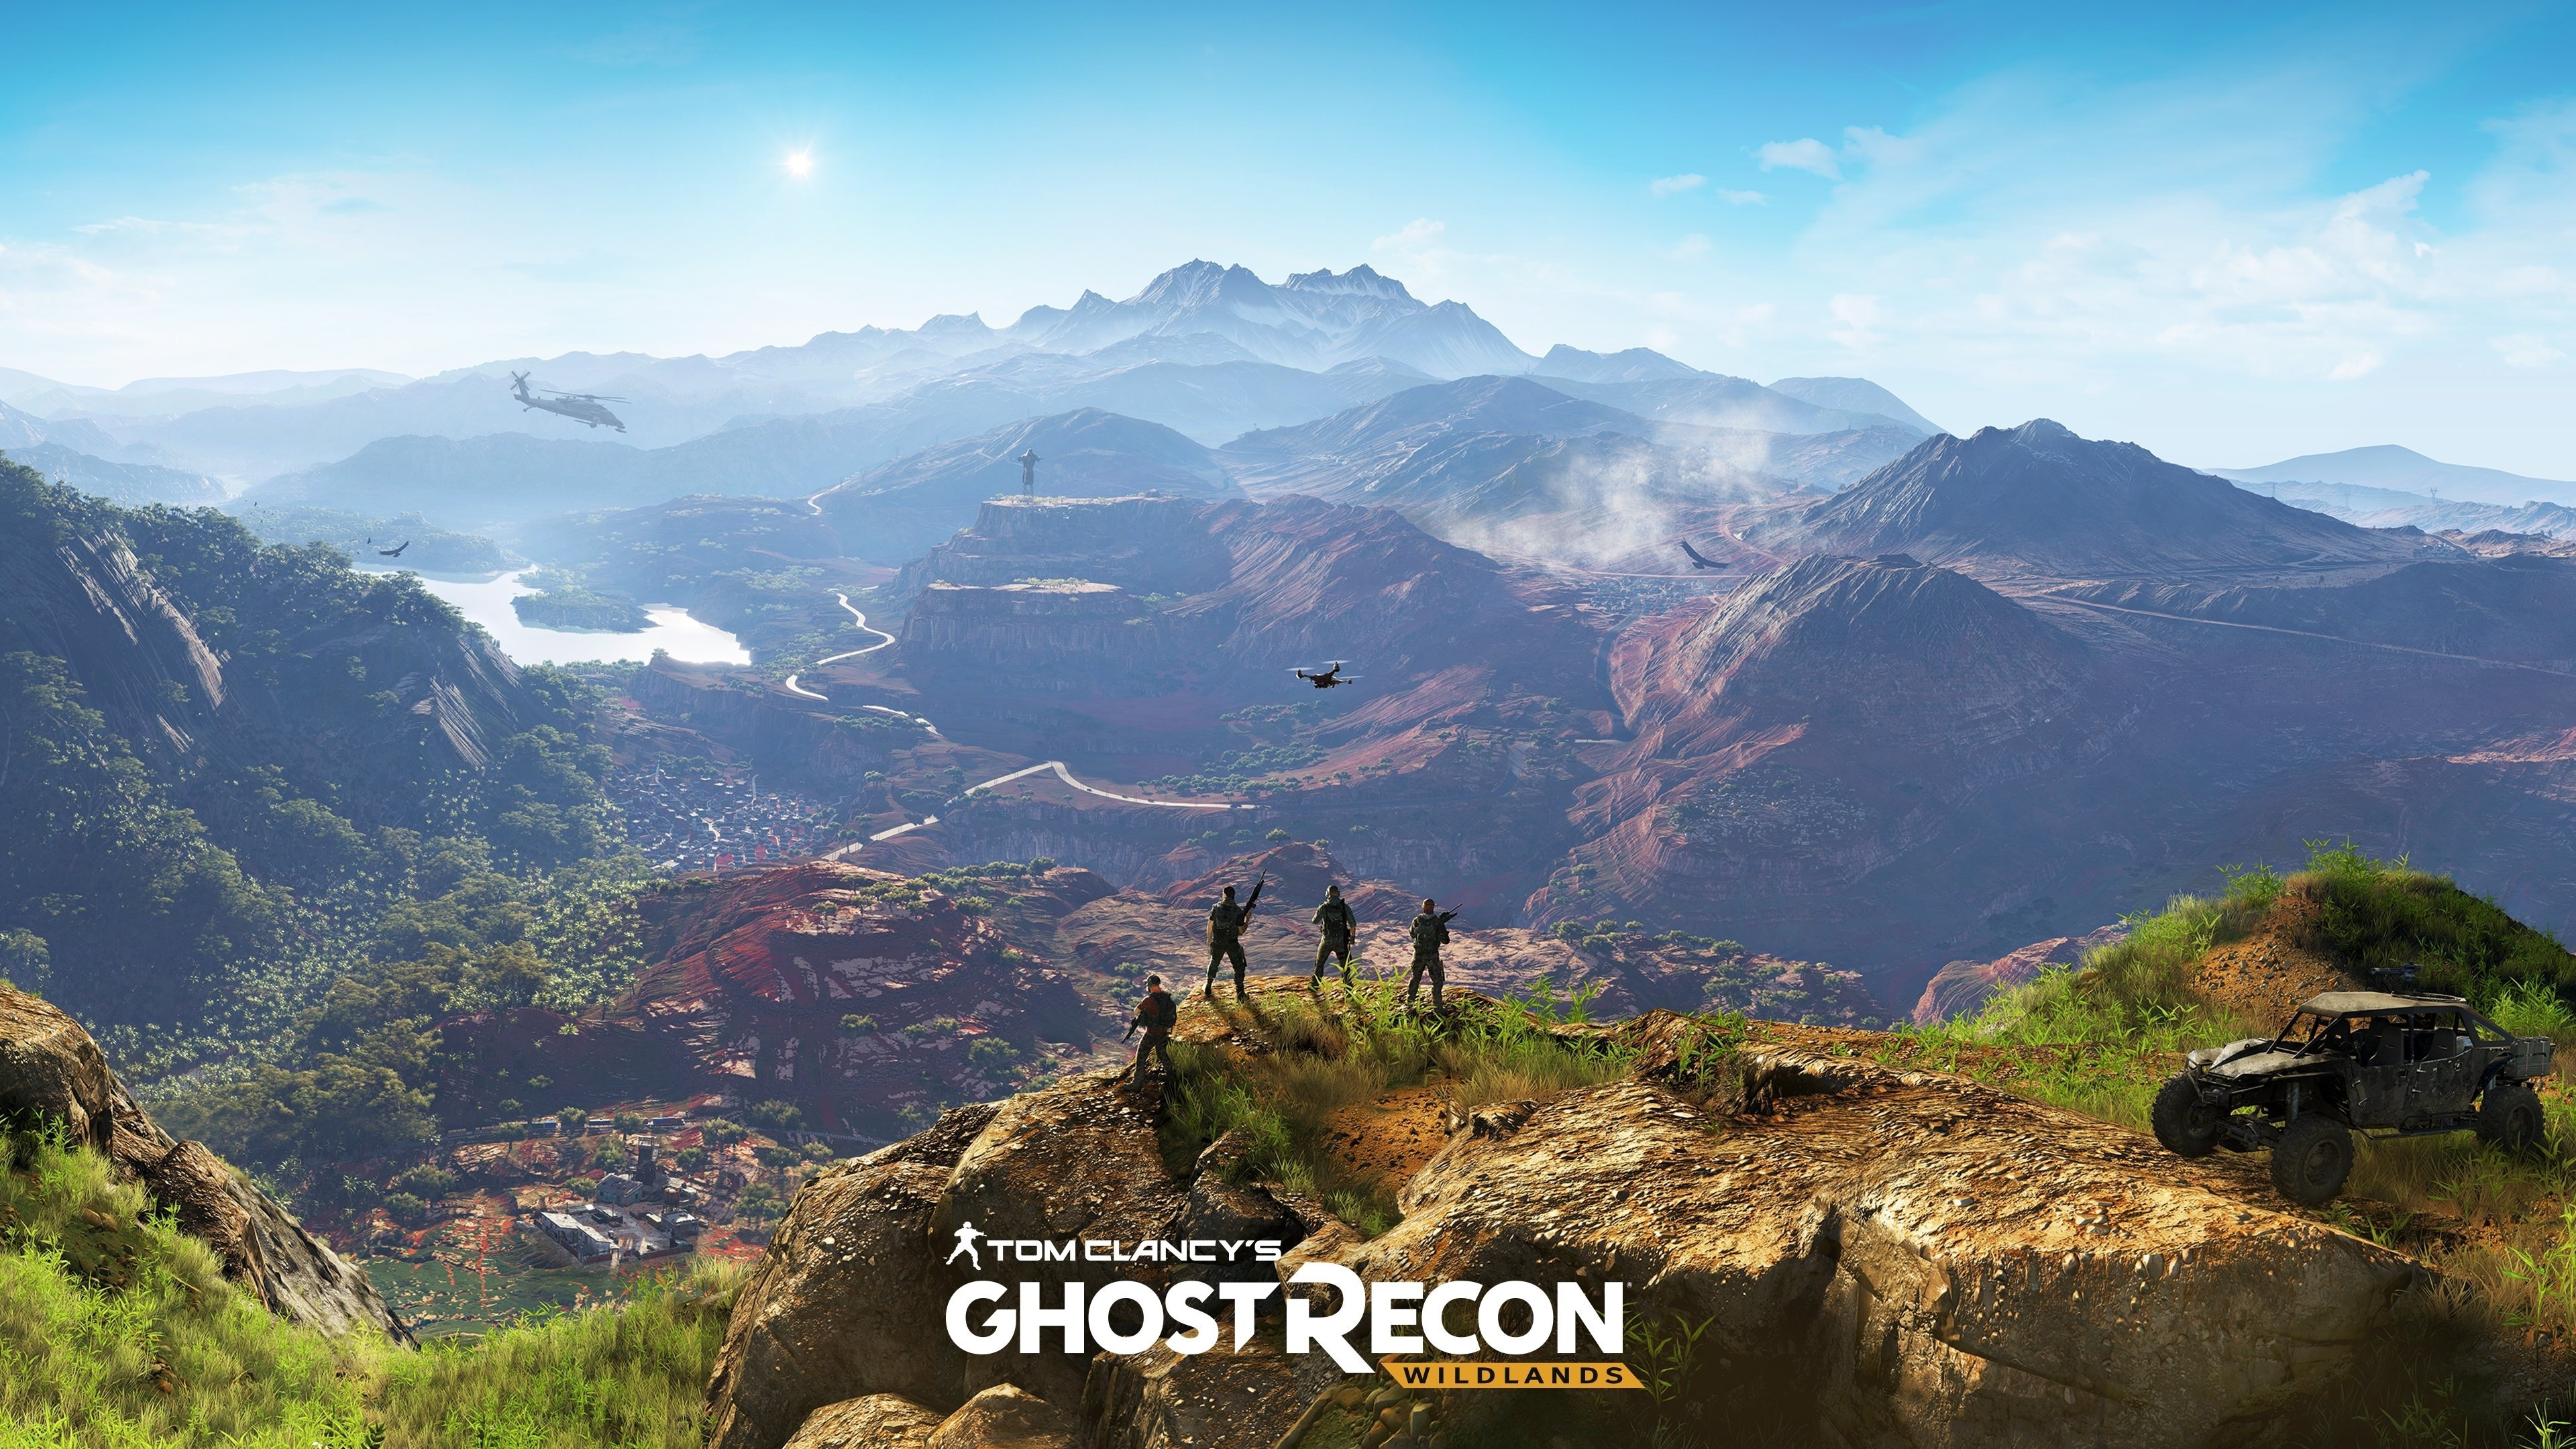 Tom Clancys Ghost Recon Wildlands Widescreen